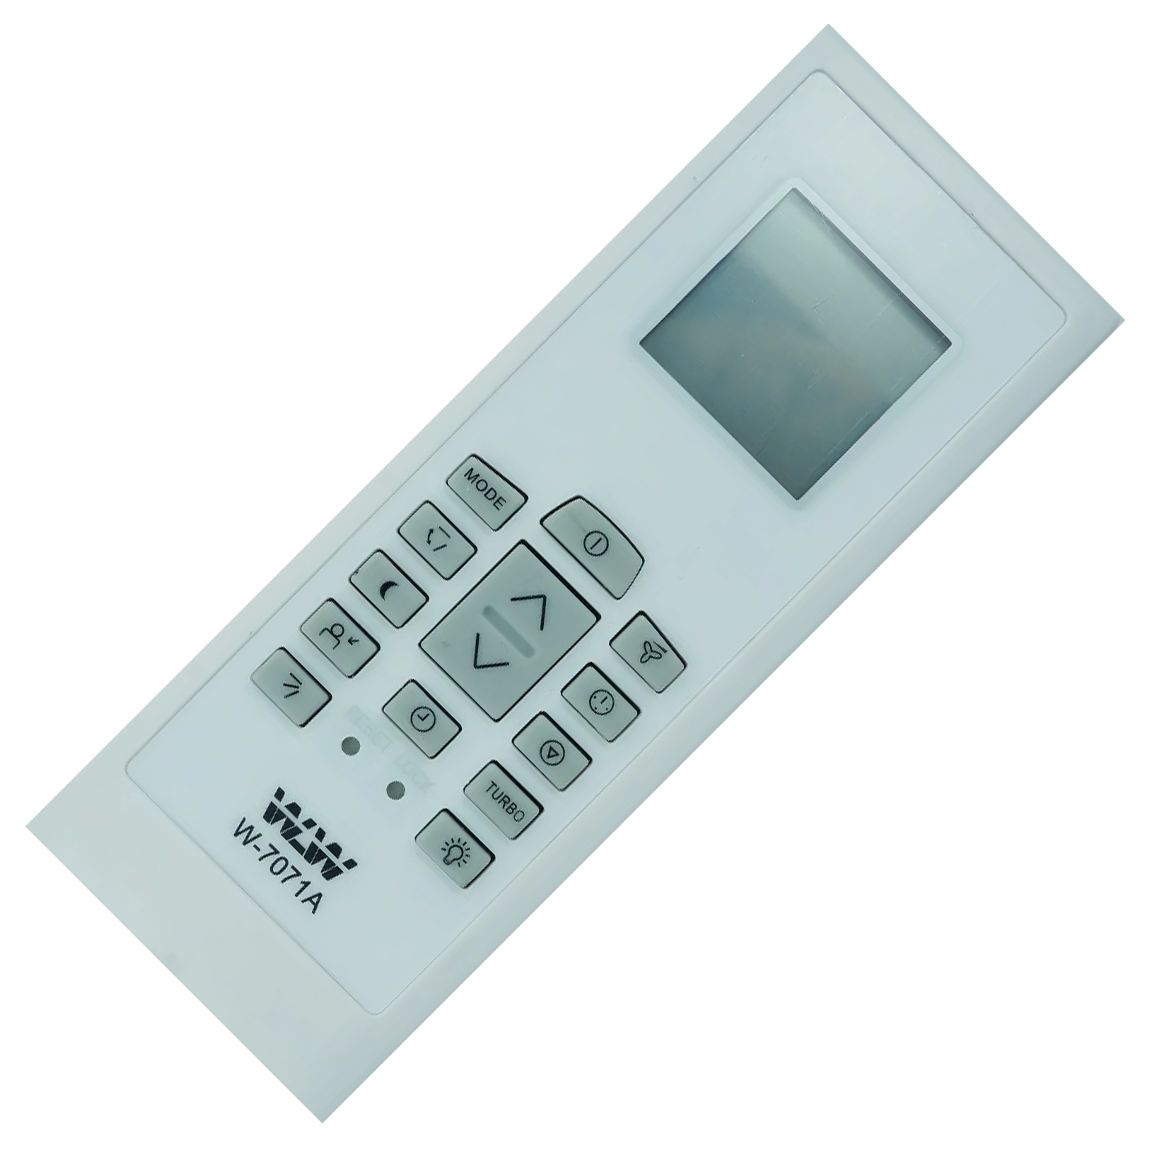 Controle Remoto Ar Split Electrolux Rg01 pi07r 09r Compatível